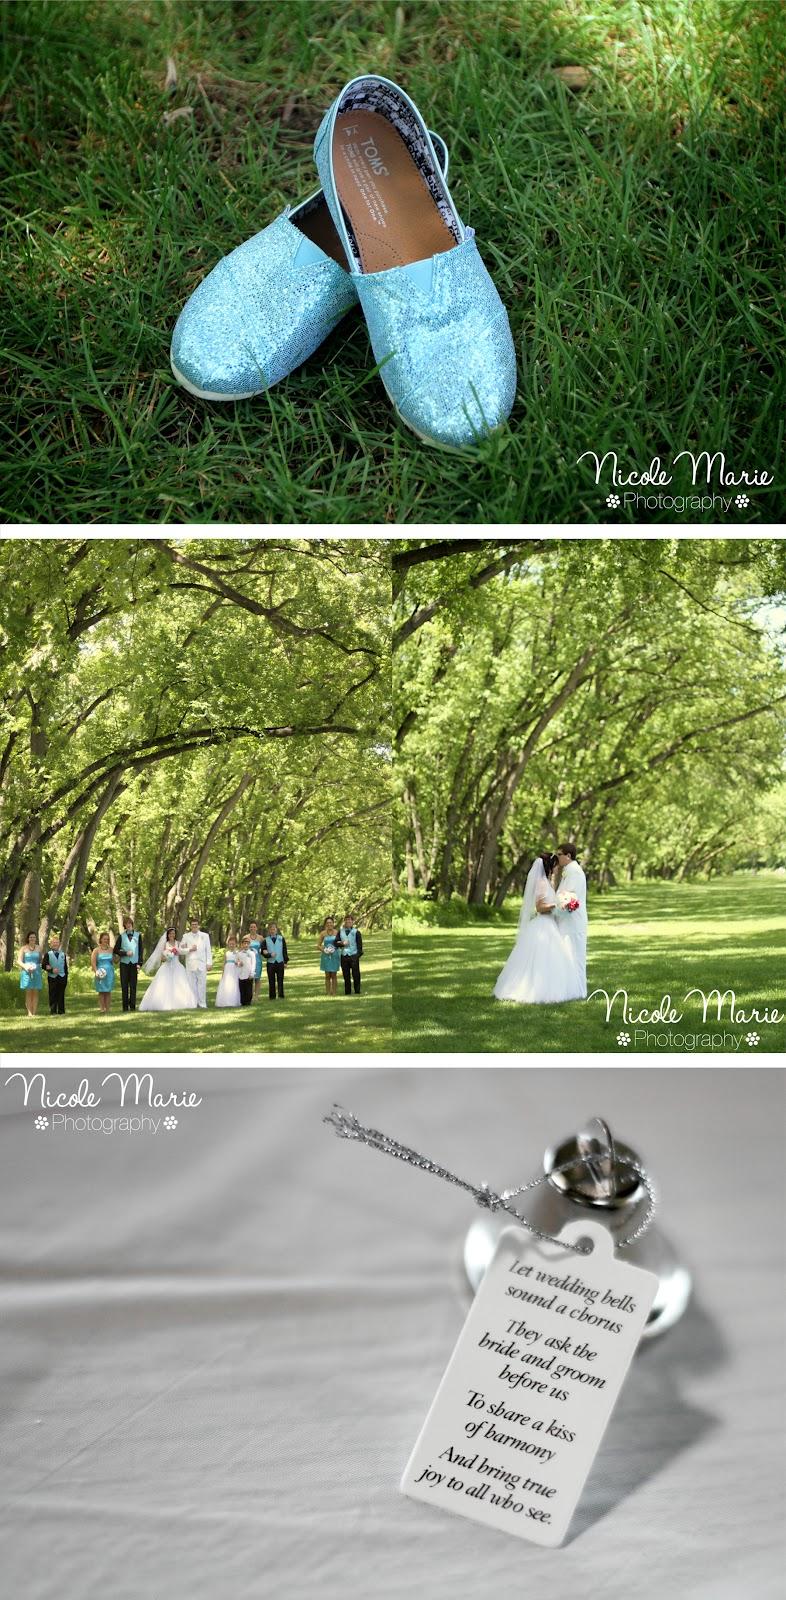 Wedding Photography Sioux Falls Sd: Sioux Falls, SD Wedding Photographer